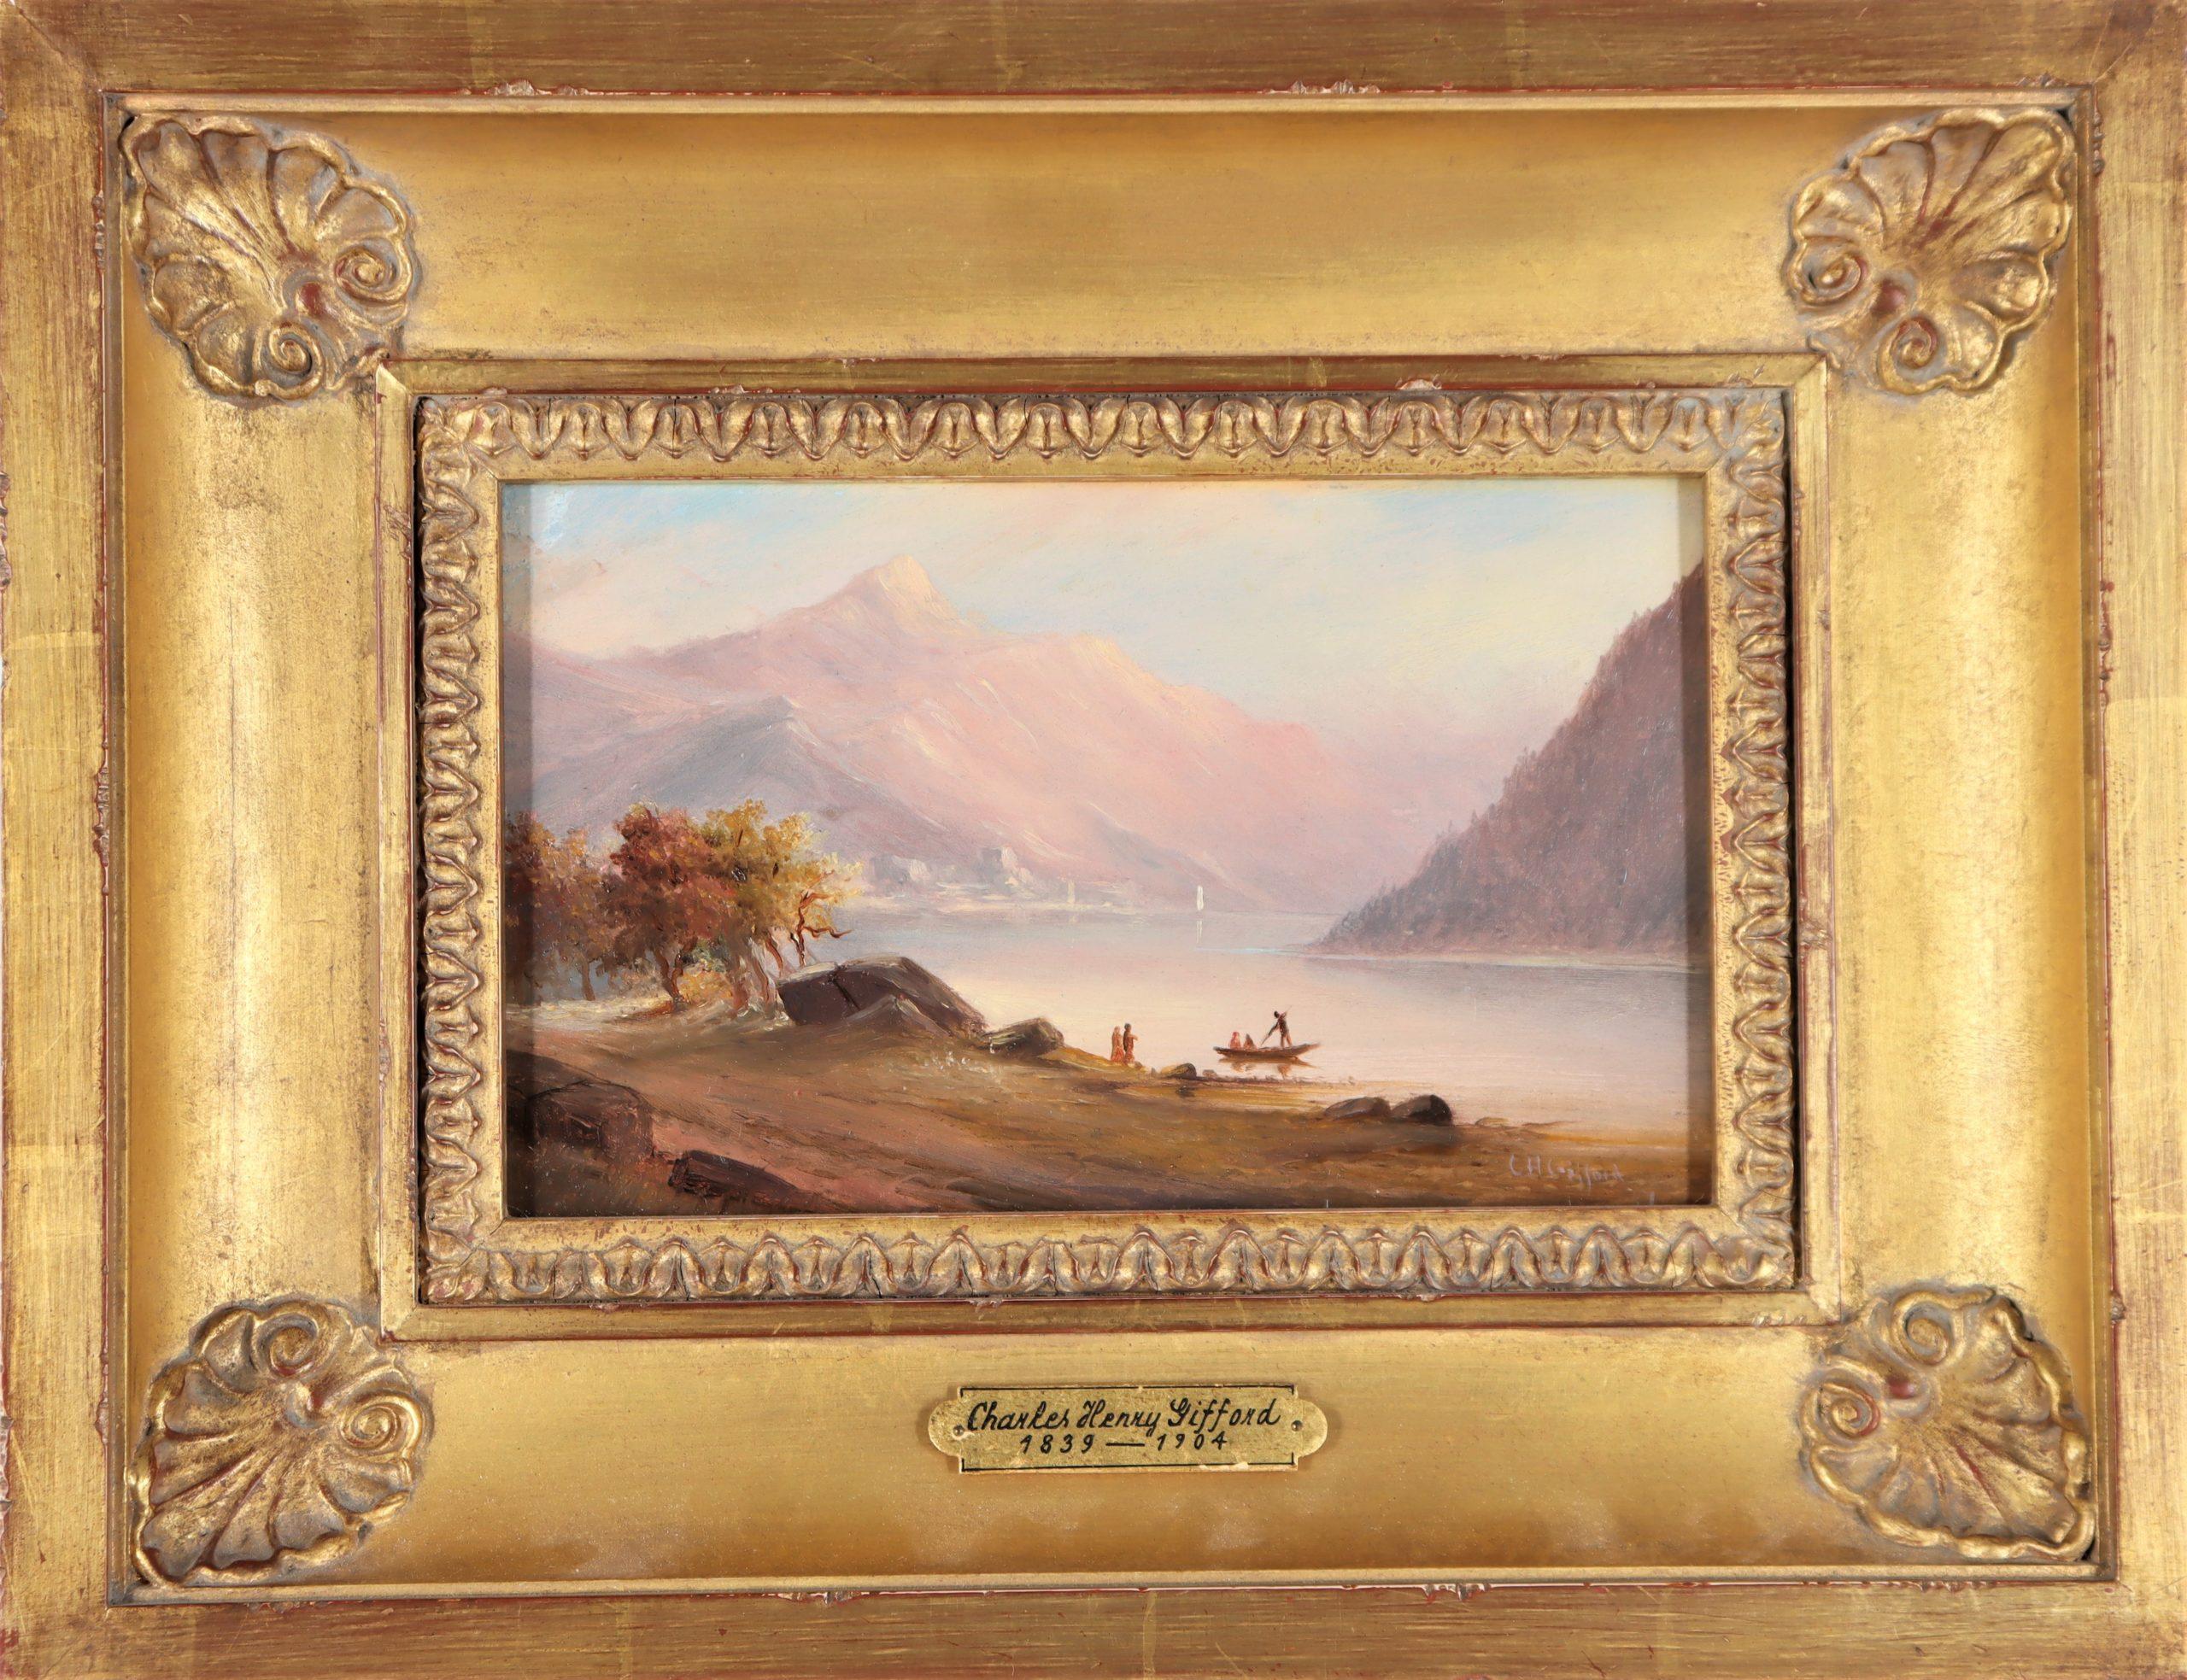 Charles Henry Gifford (1839-1904)